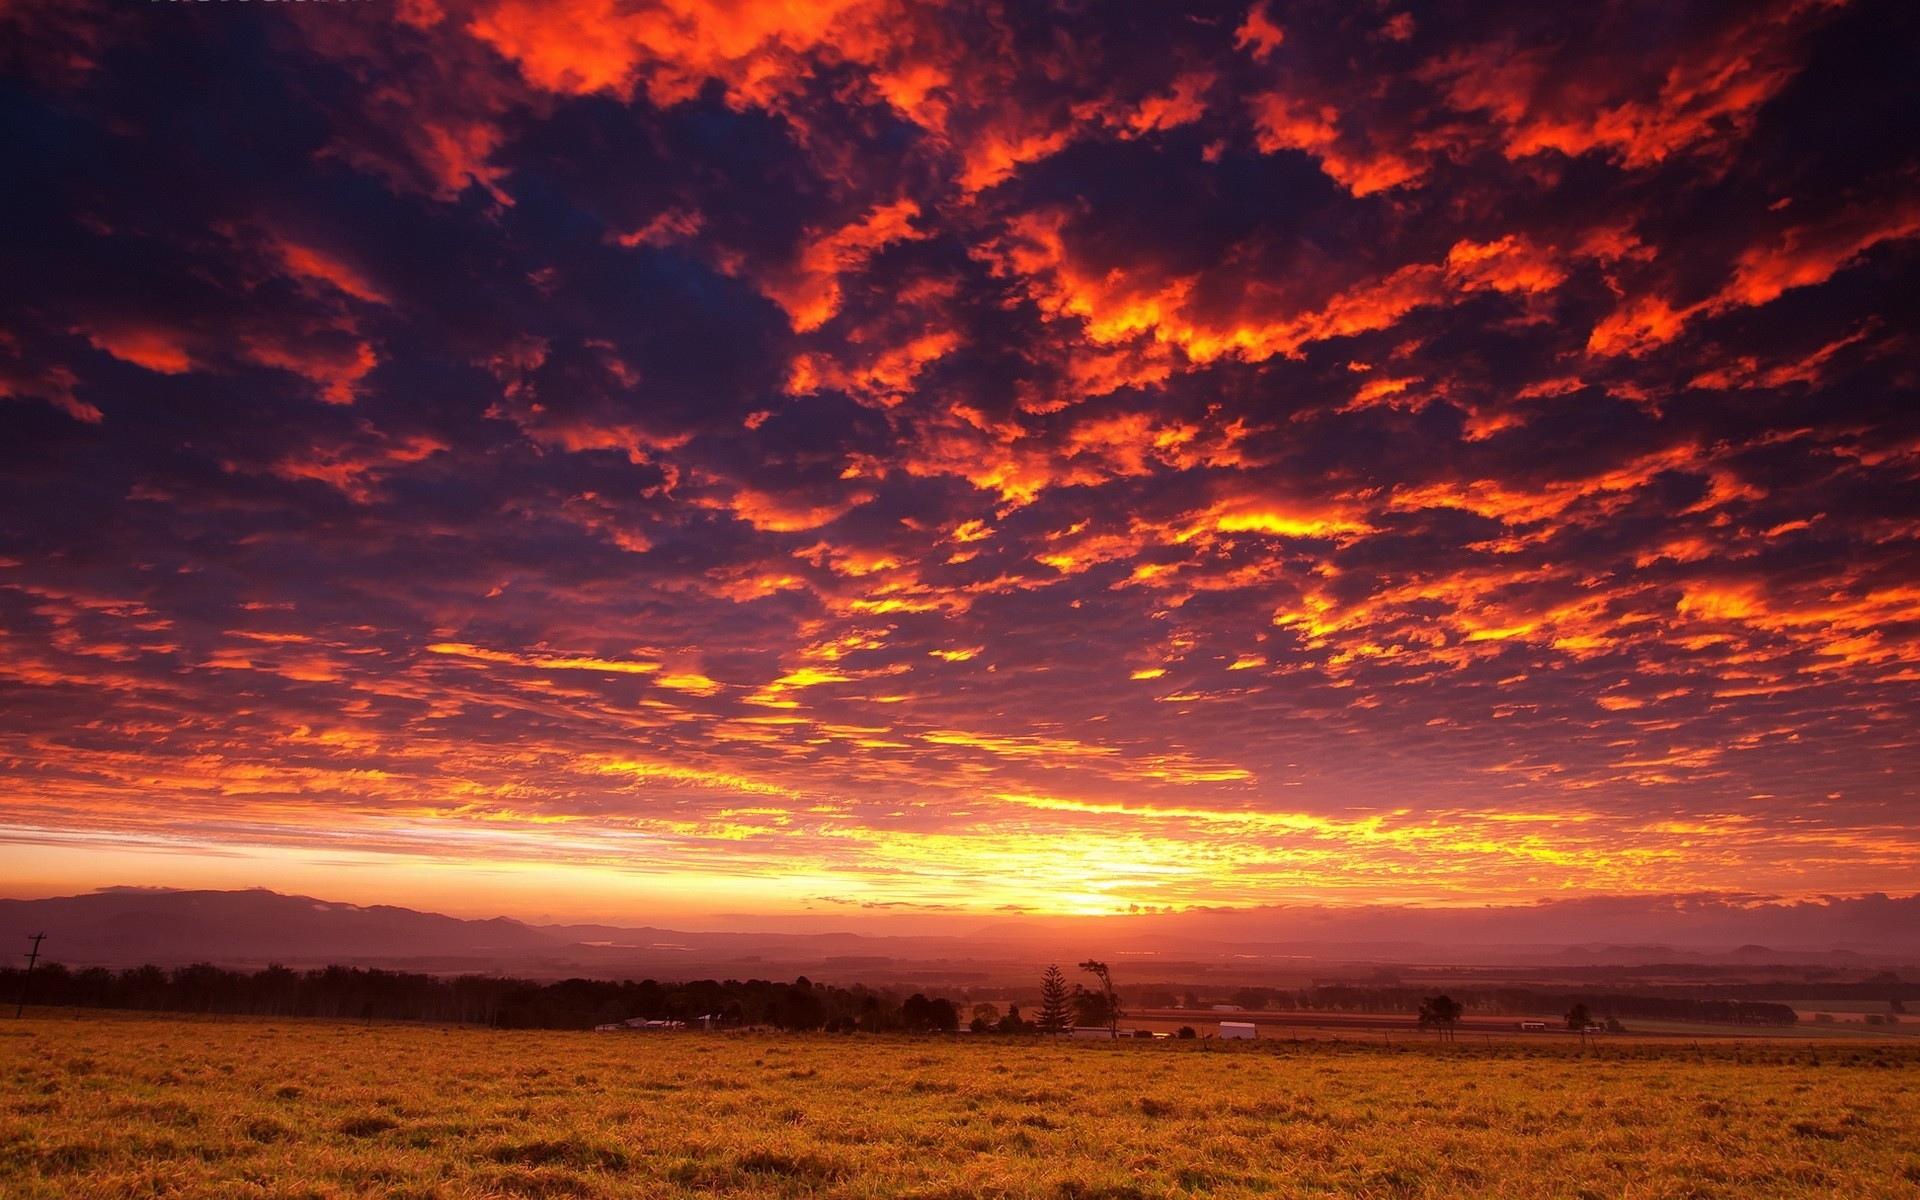 Sky HD Wallpaper | Background Image | 1920x1200 | ID ...